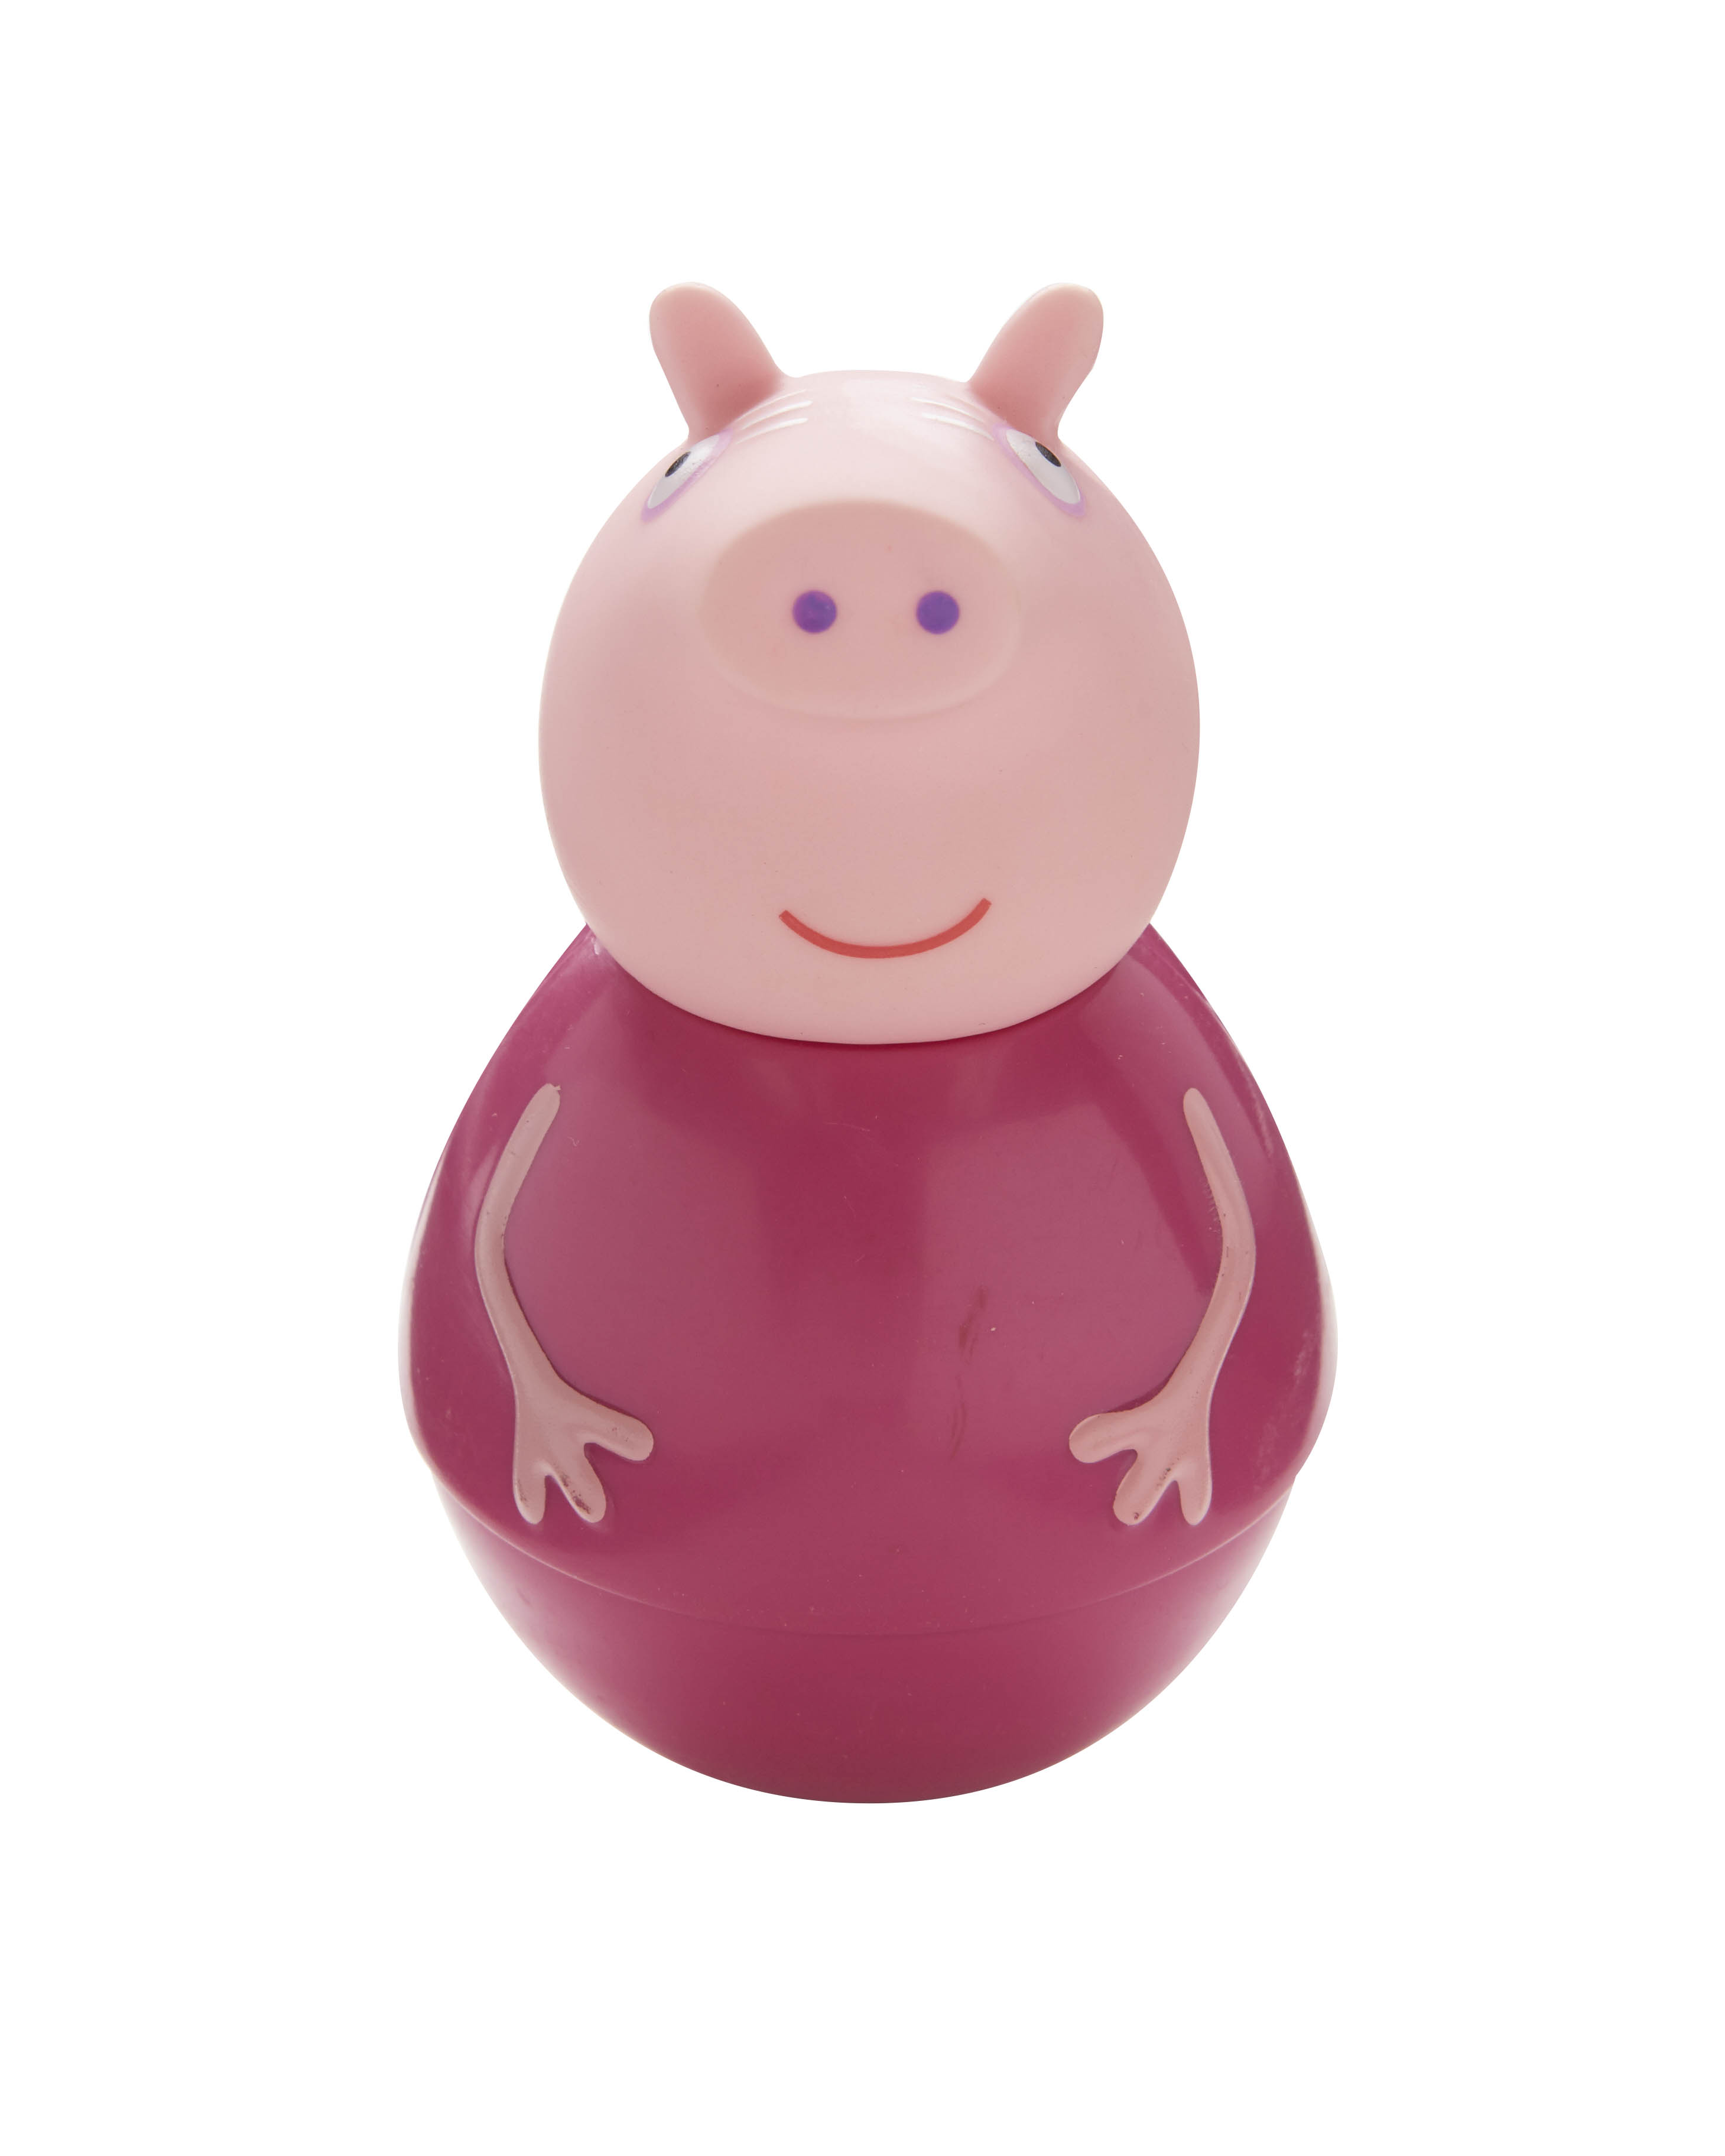 Купить Фигурка-неваляшка Weebles «Бабушка Пеппы» тм Peppa Pig, Росмэн